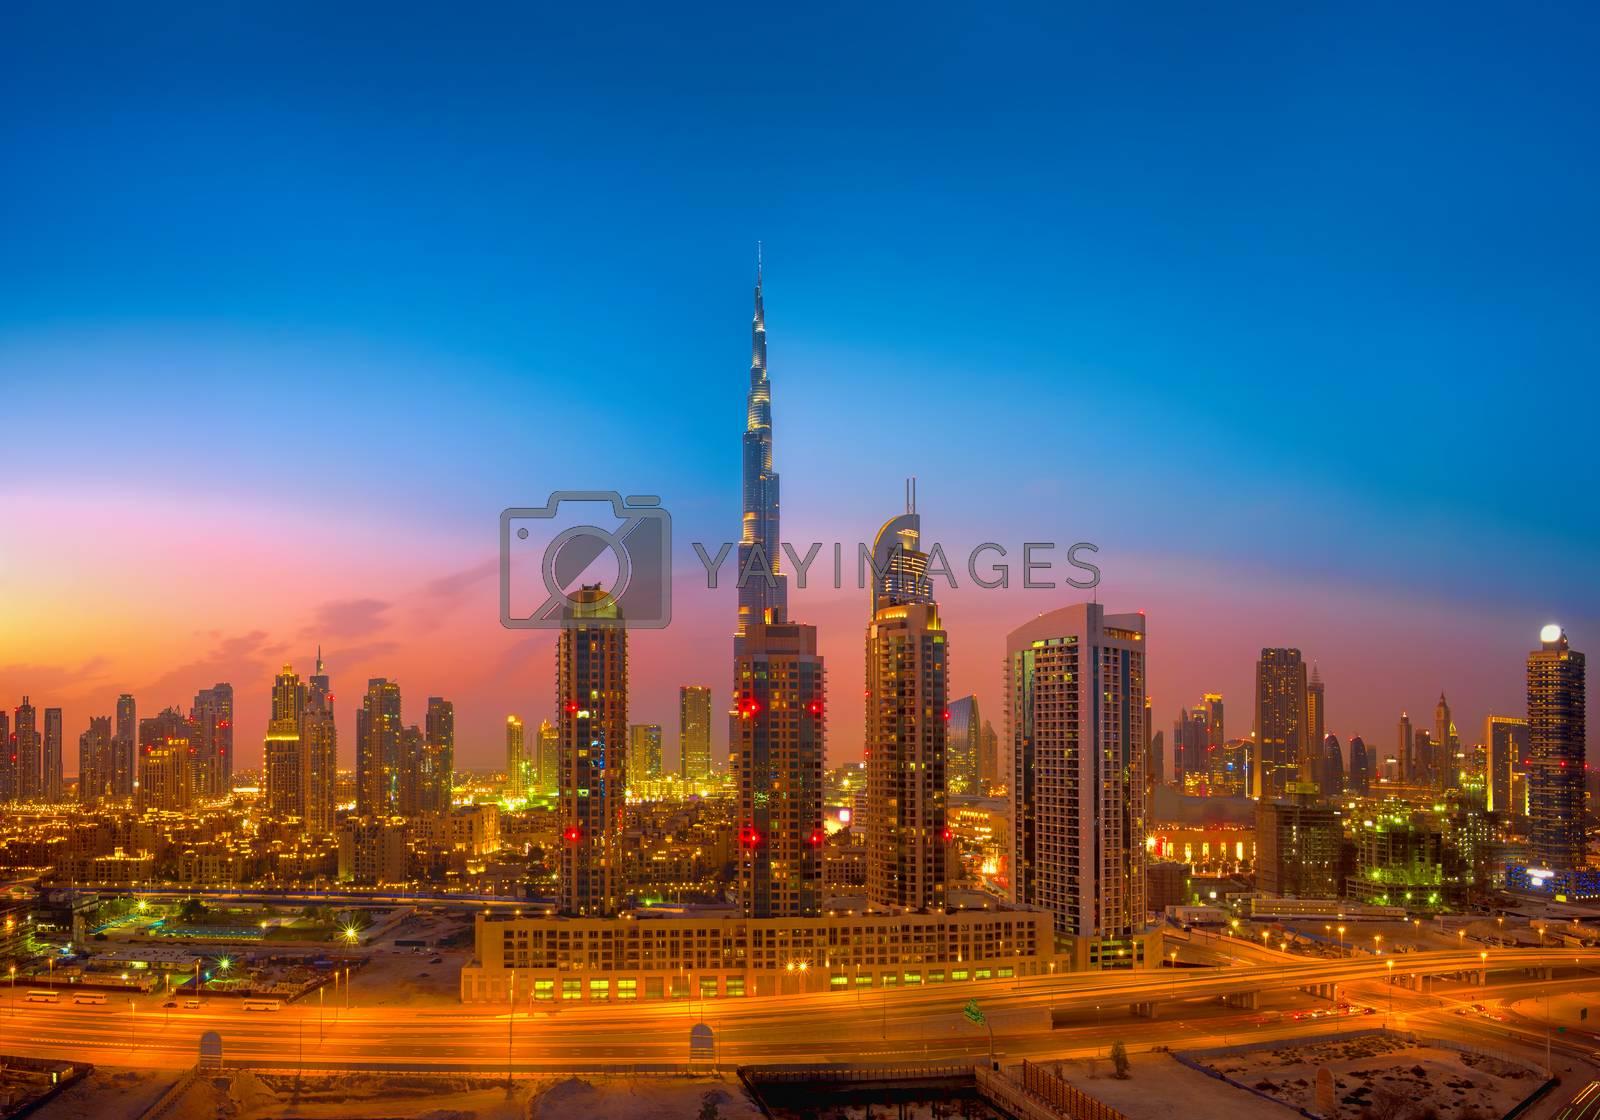 Dubai Skyline photographed during the golden hour